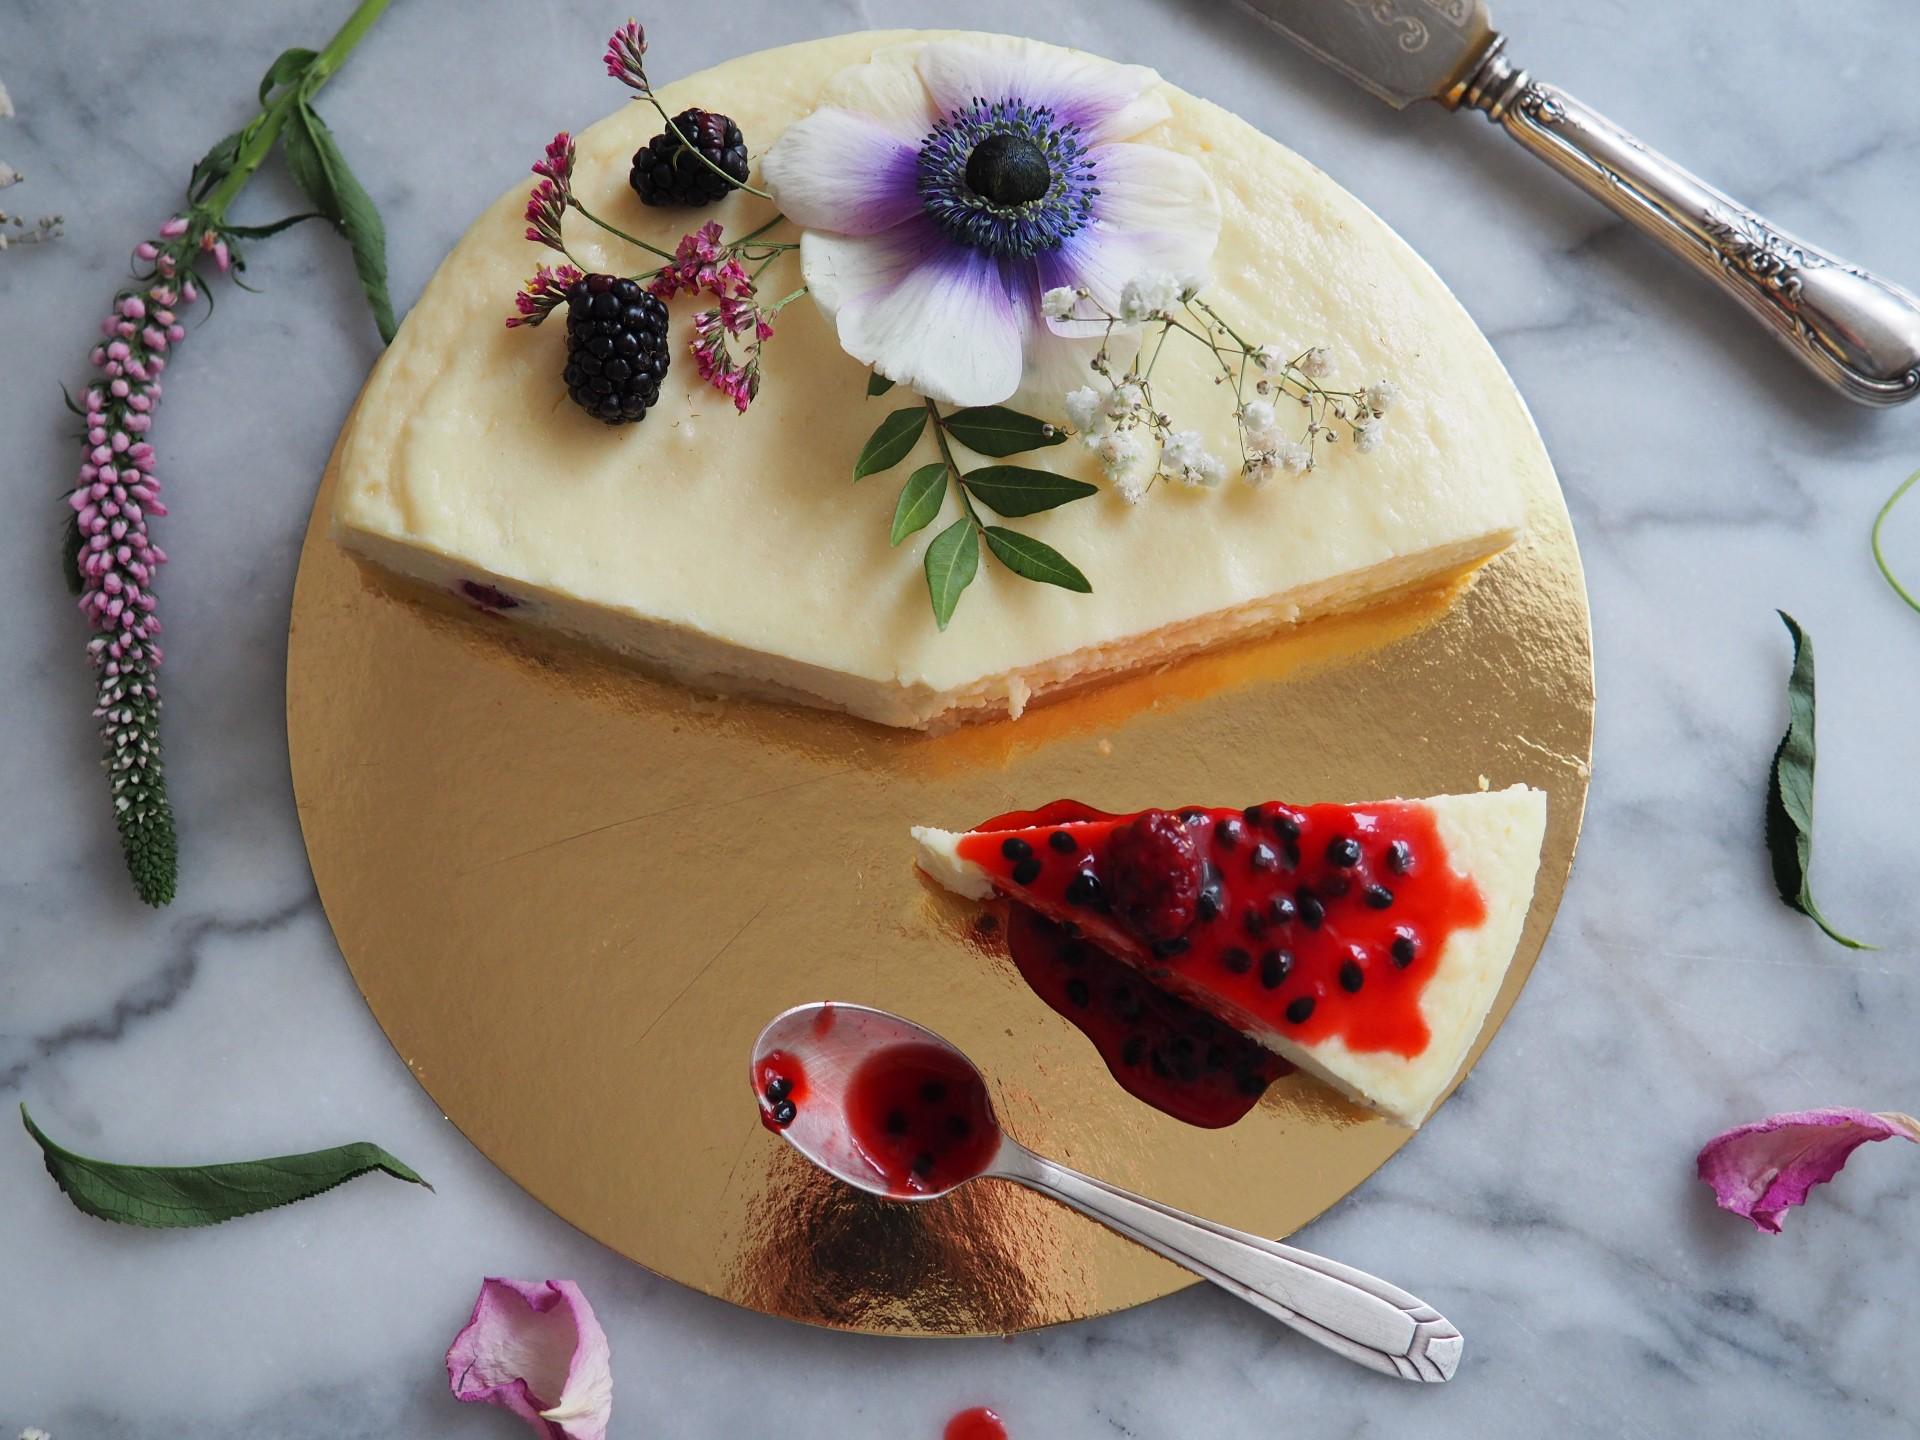 Blackberry & Passionfruit Cheesecake